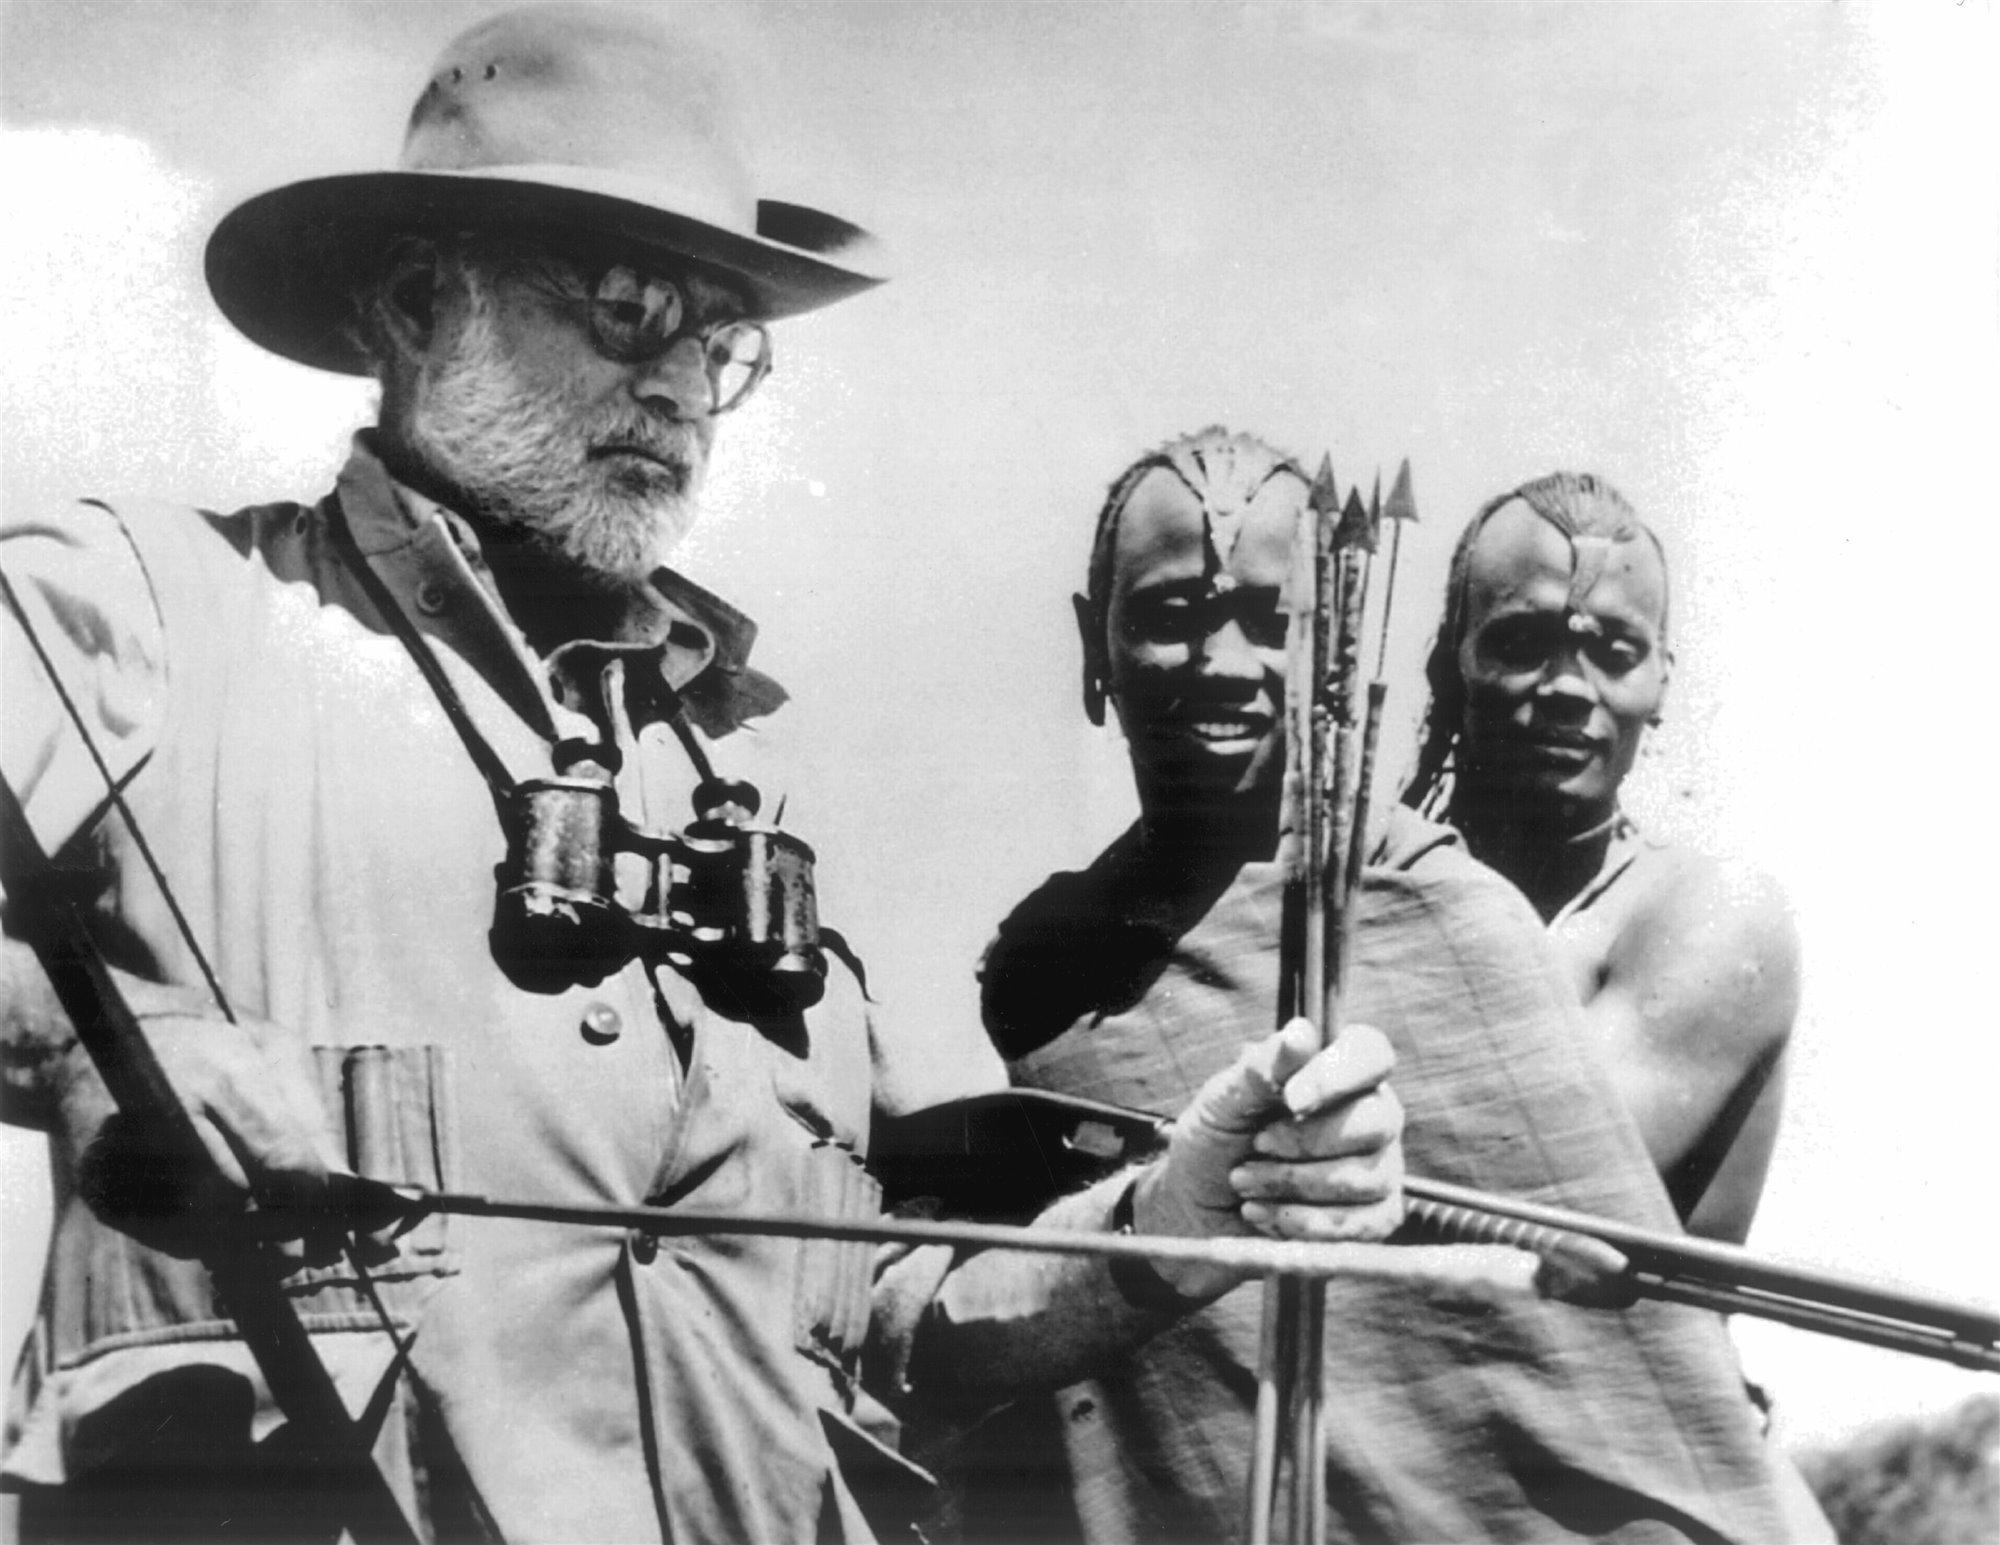 Ernest Hemingway, un mito de la literatura mundial